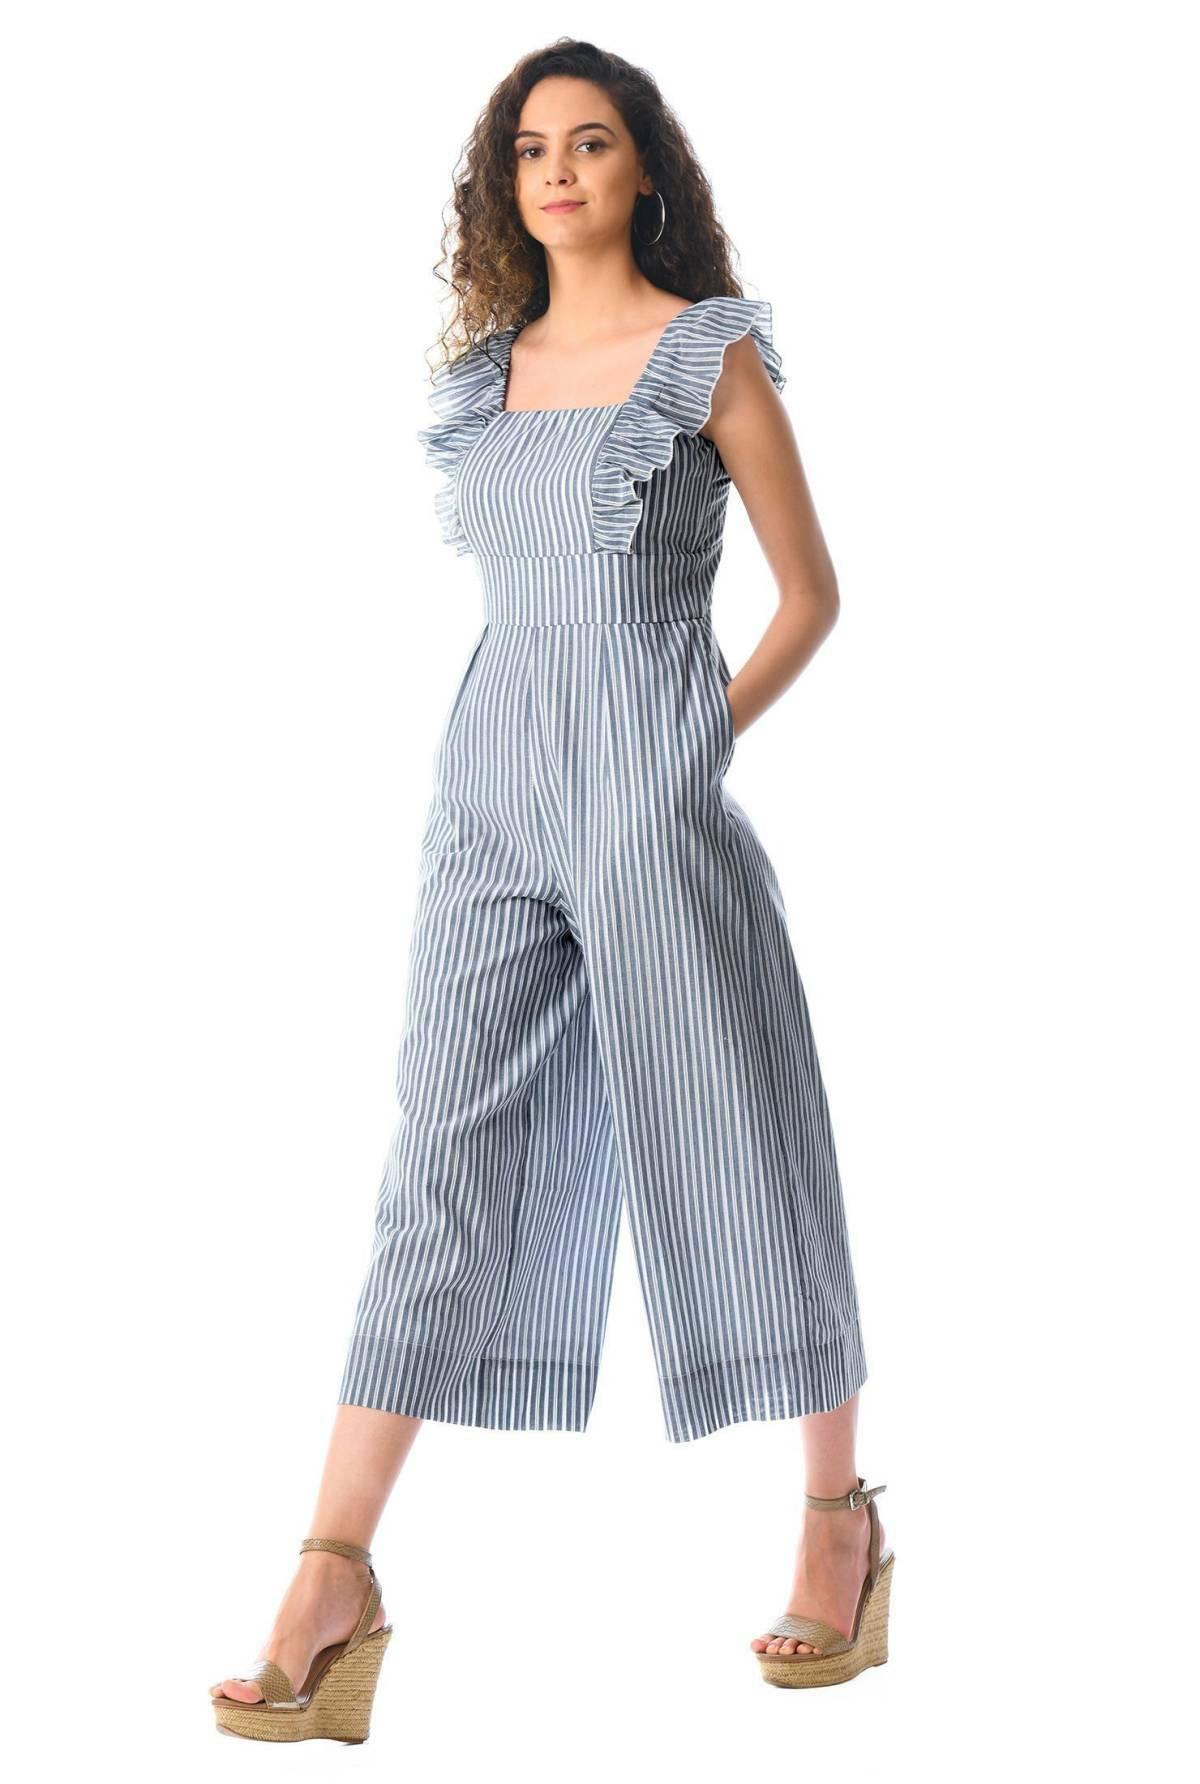 3 Model Jumpsuit yang Bikin Penampilan Makin Fashionable